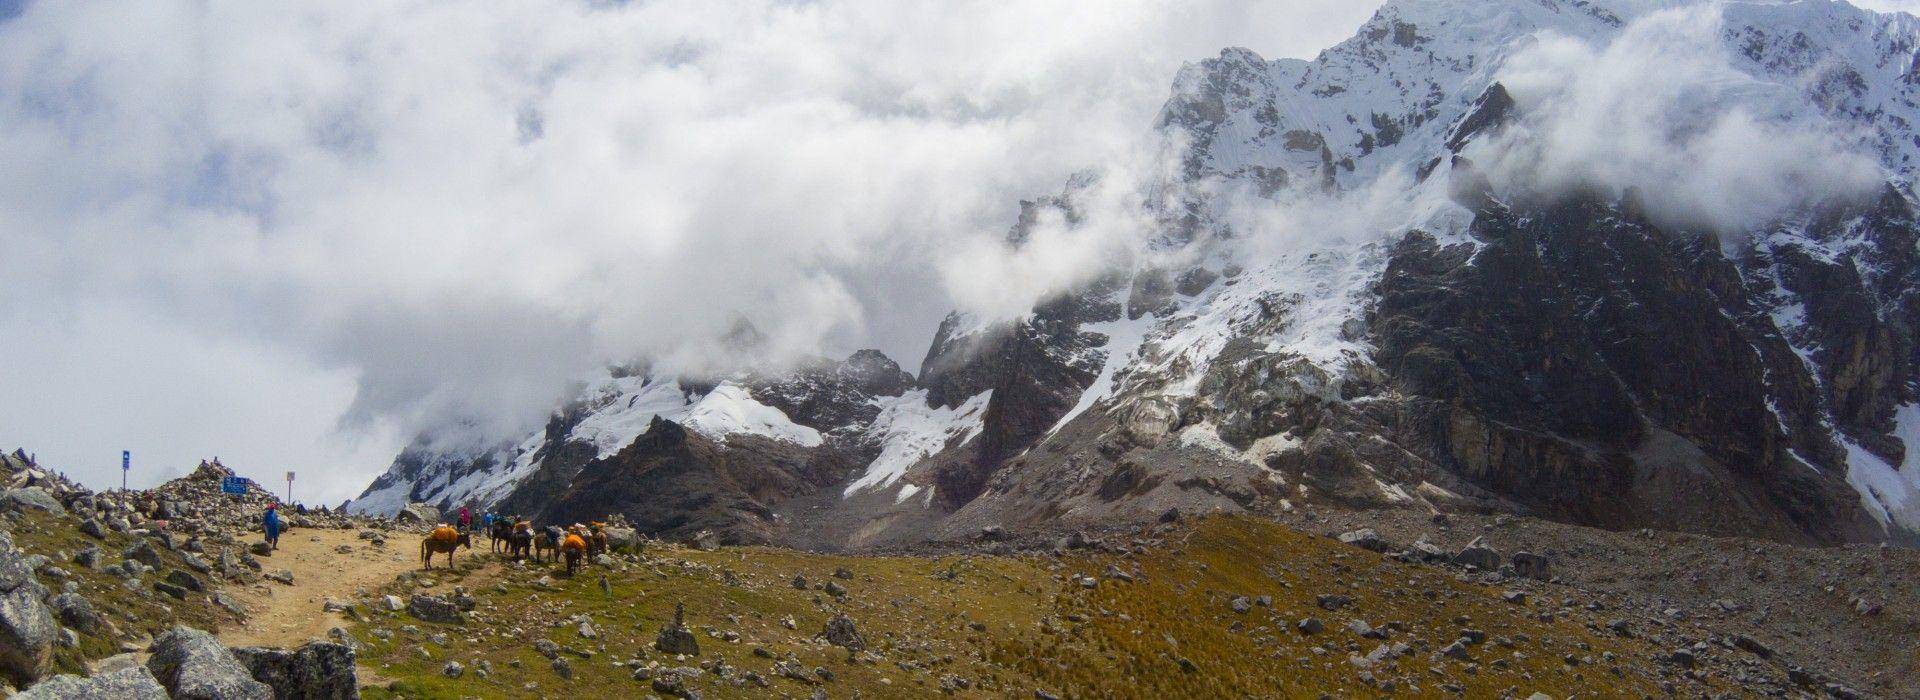 Luxury Tours in Peru